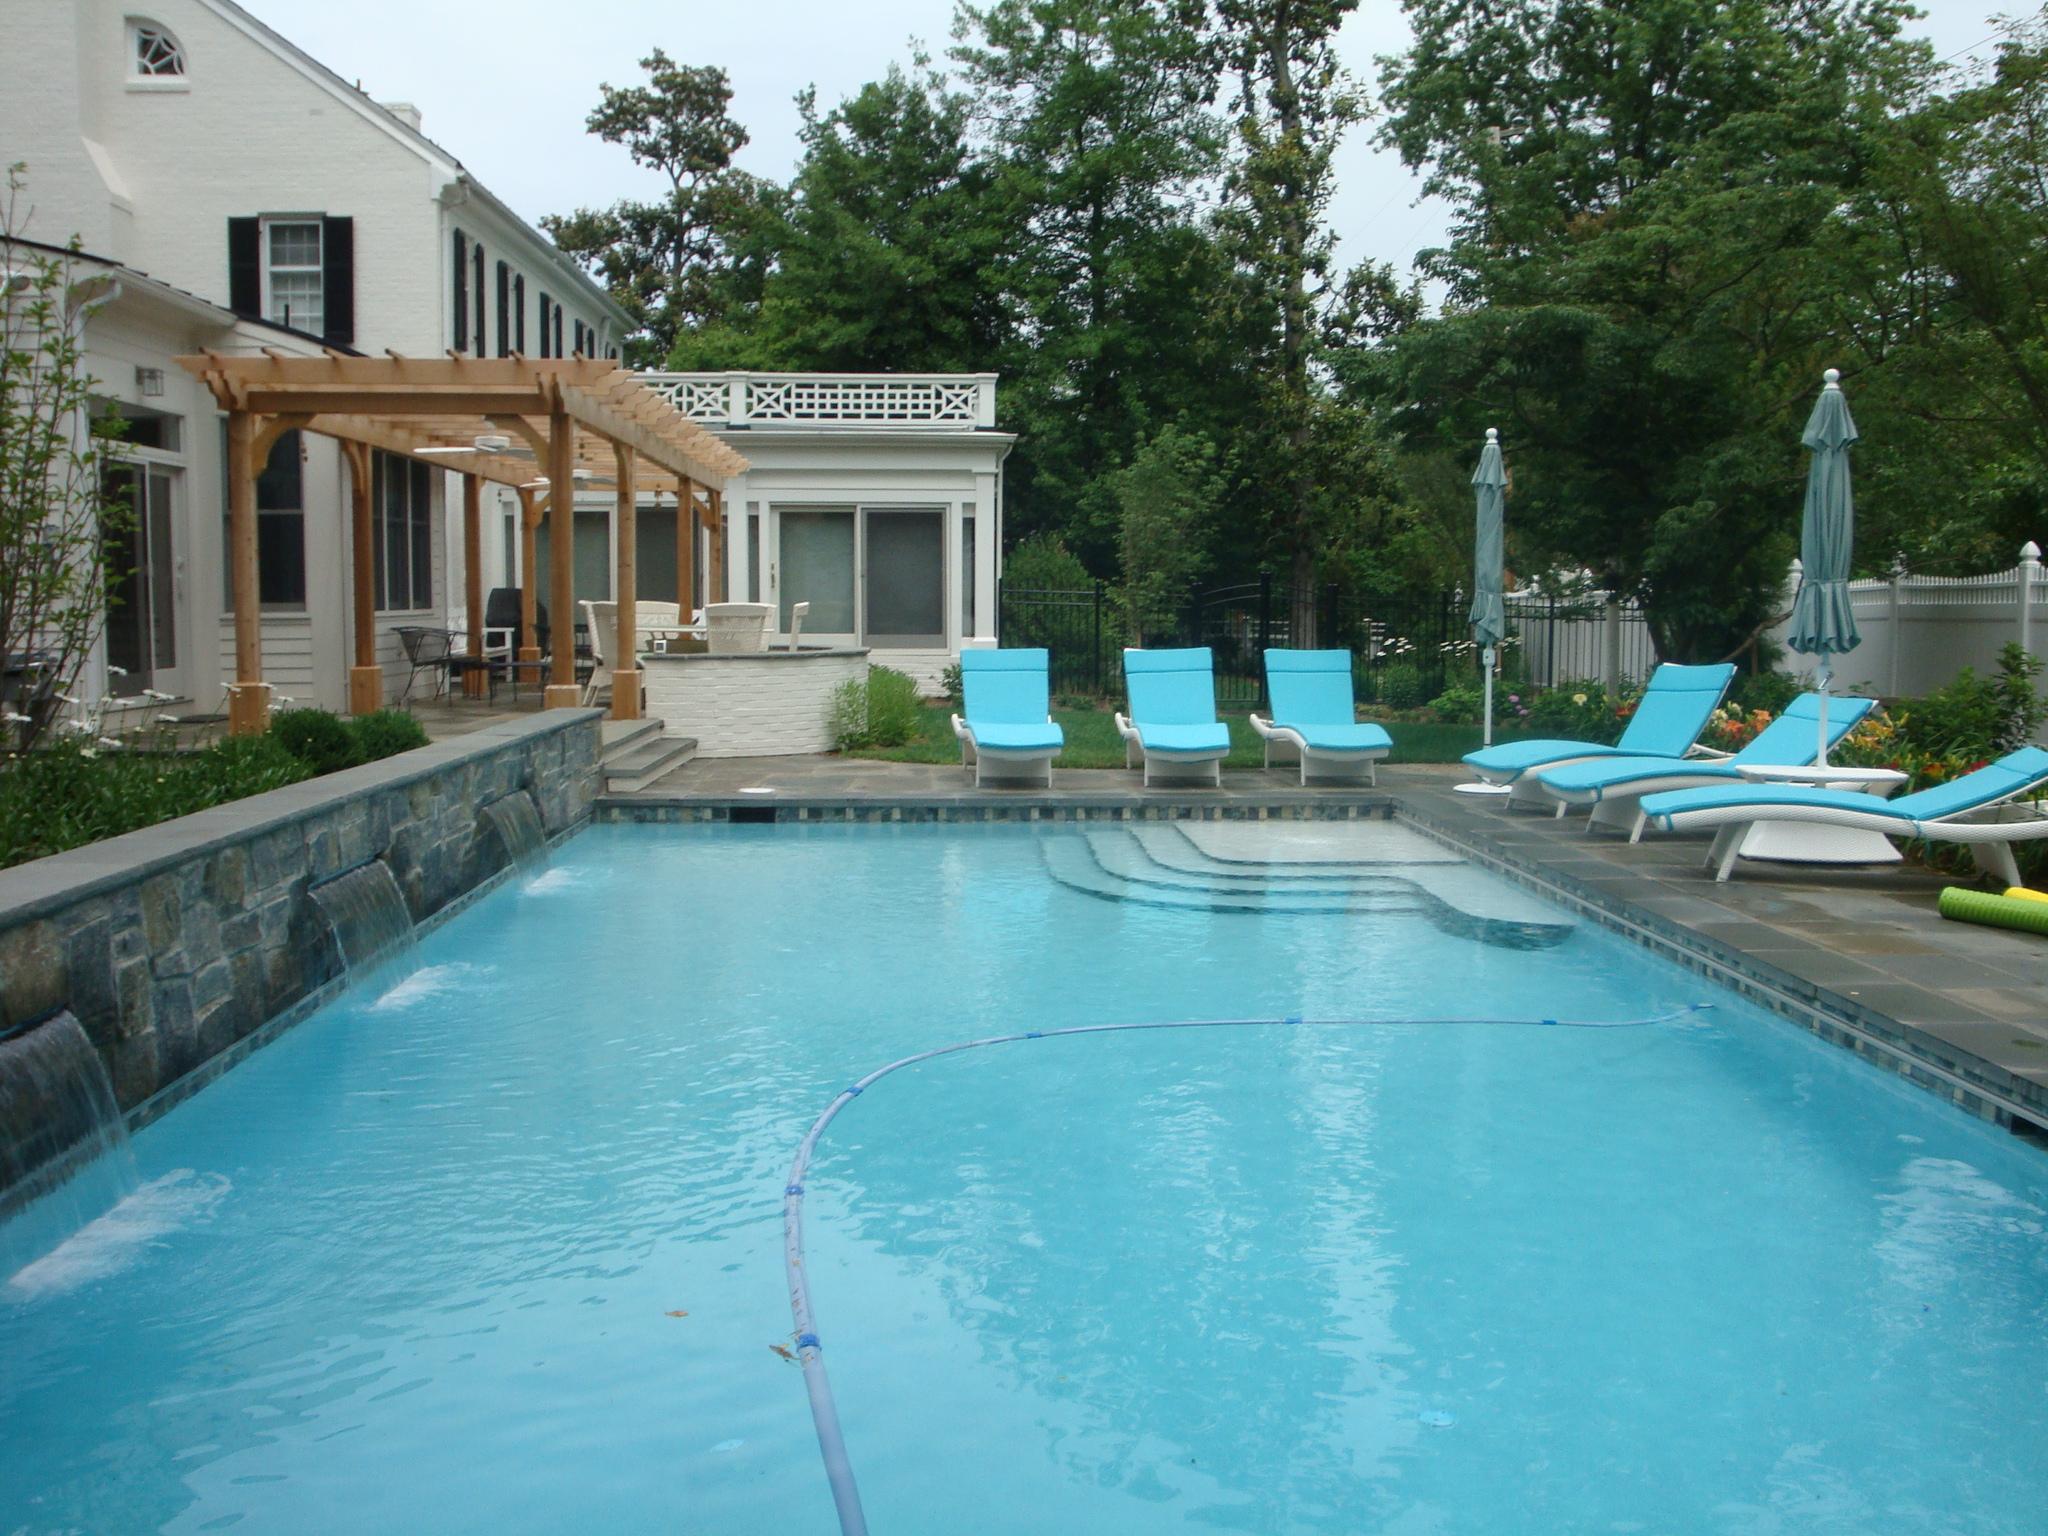 Fredericksburg Pool, Patio & Pergola Design ... on Pool Patio Design id=29608